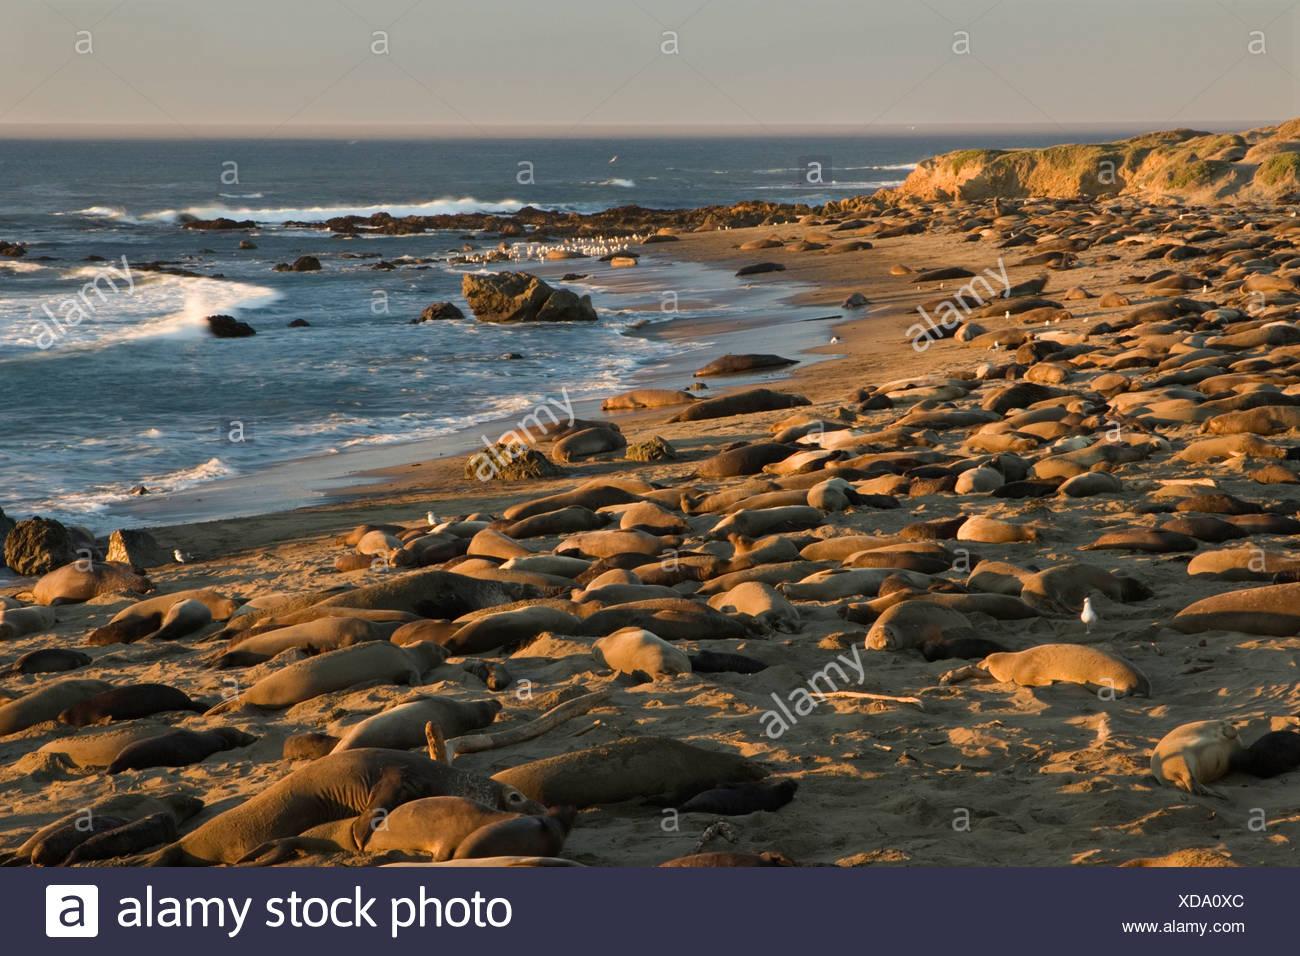 Northern elephant seals (Mirounga angustirostris) at breeding colony, Piedras Blancas, California, USA - Stock Image